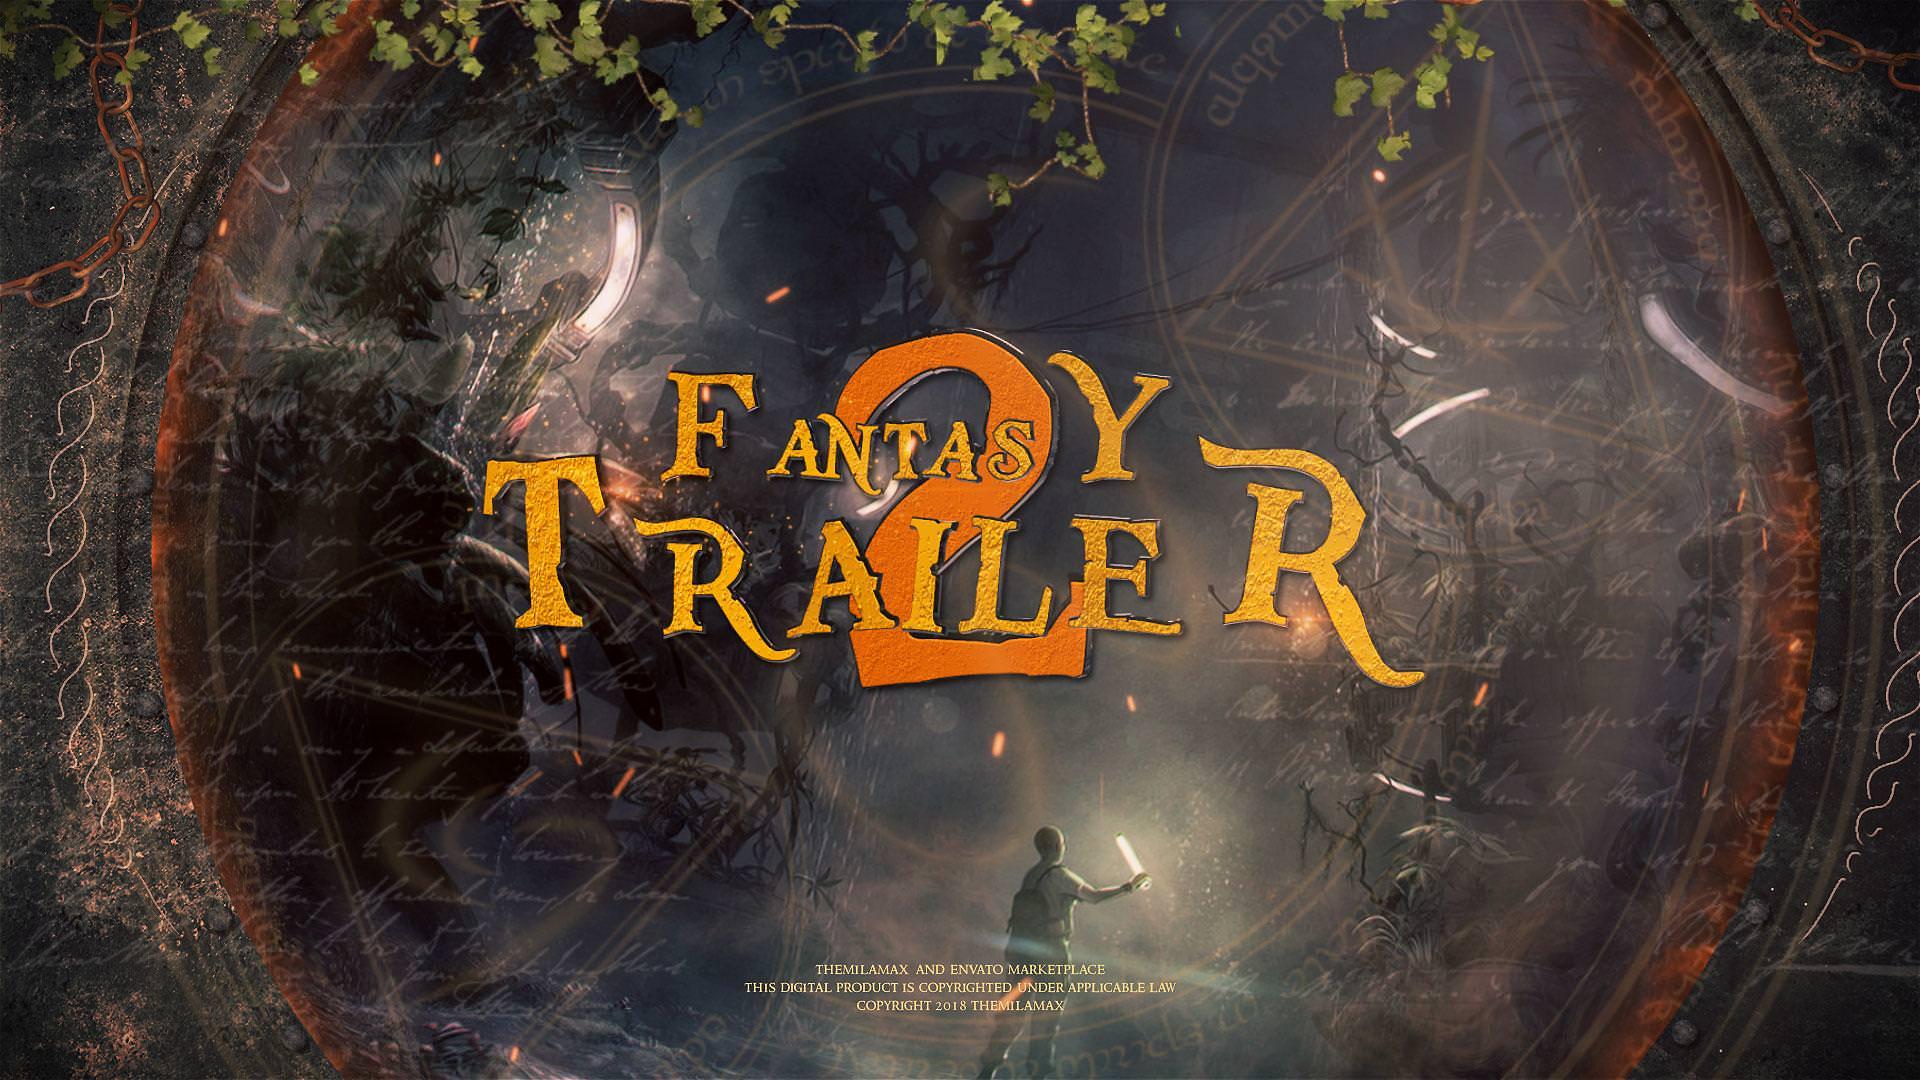 Fantasy Trailer 2 - 8